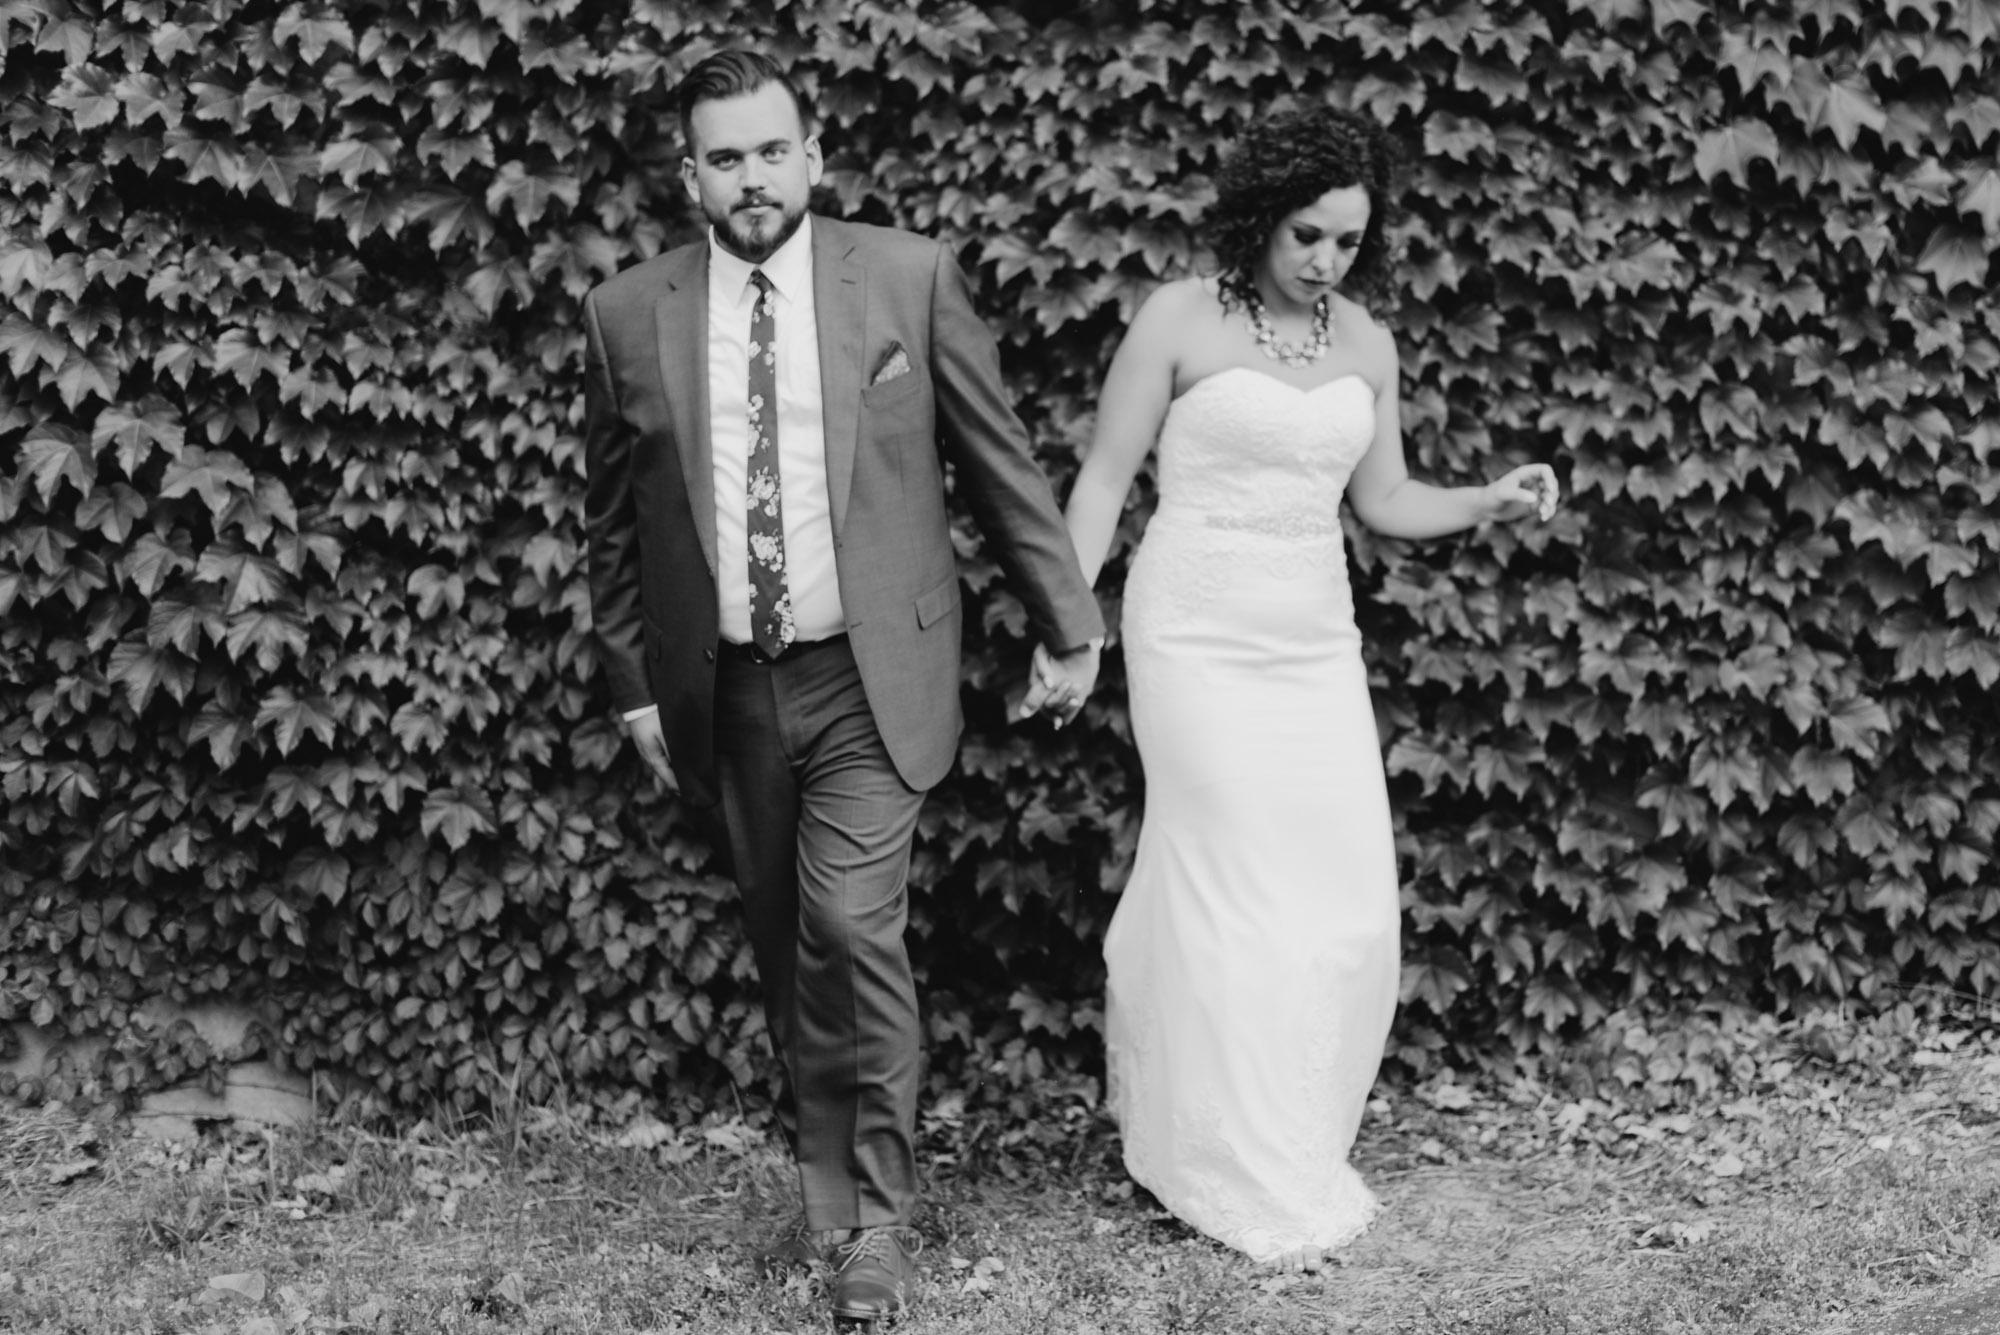 five-event-center-wedding-photographe-24.jpg